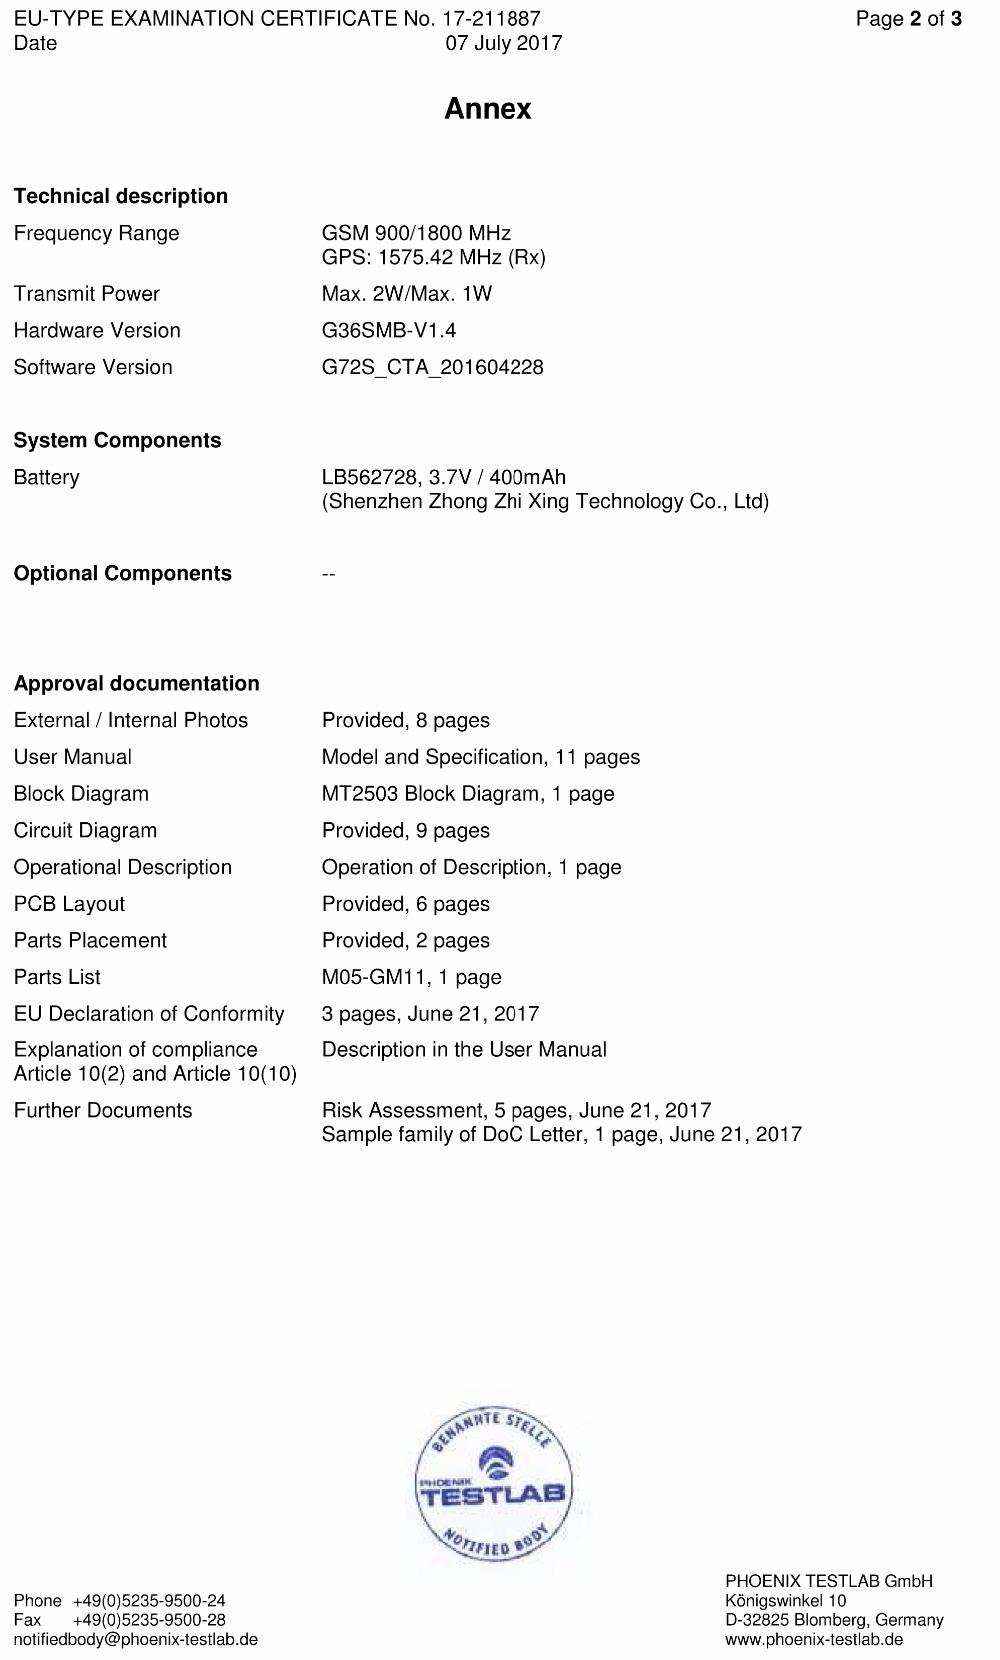 17-211887_RED Certificate_M05-2